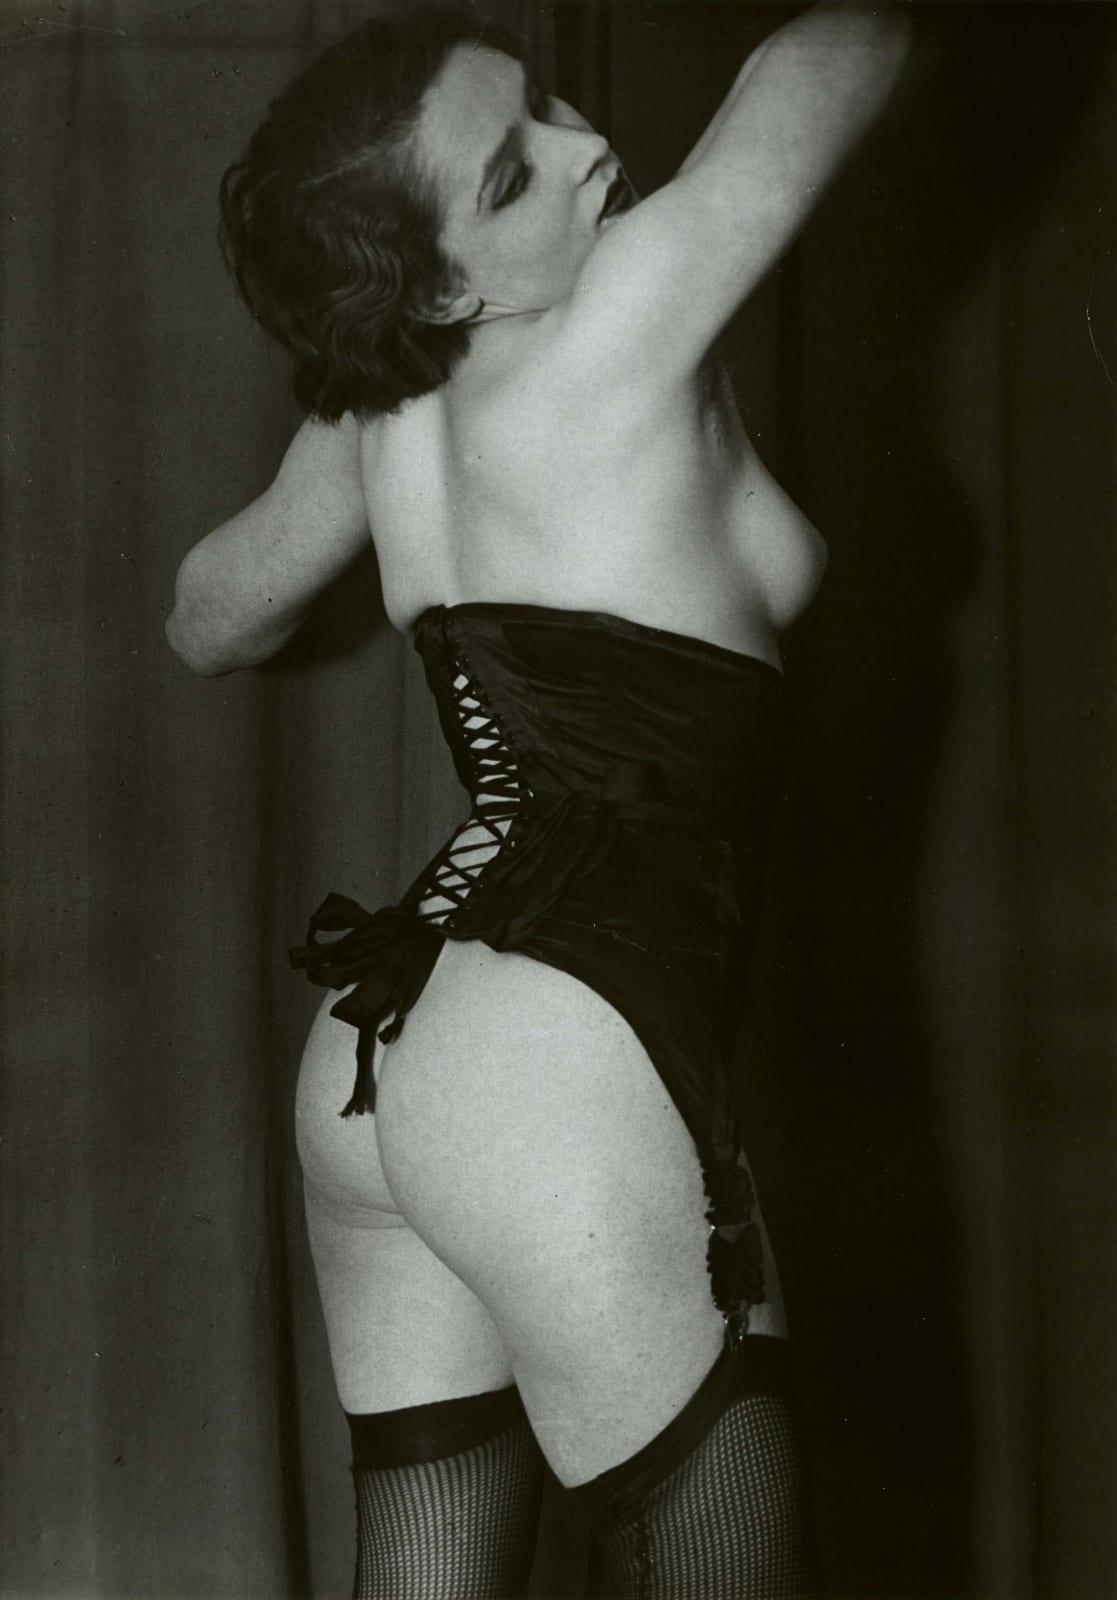 Brassai photograph of woman wearing black corset